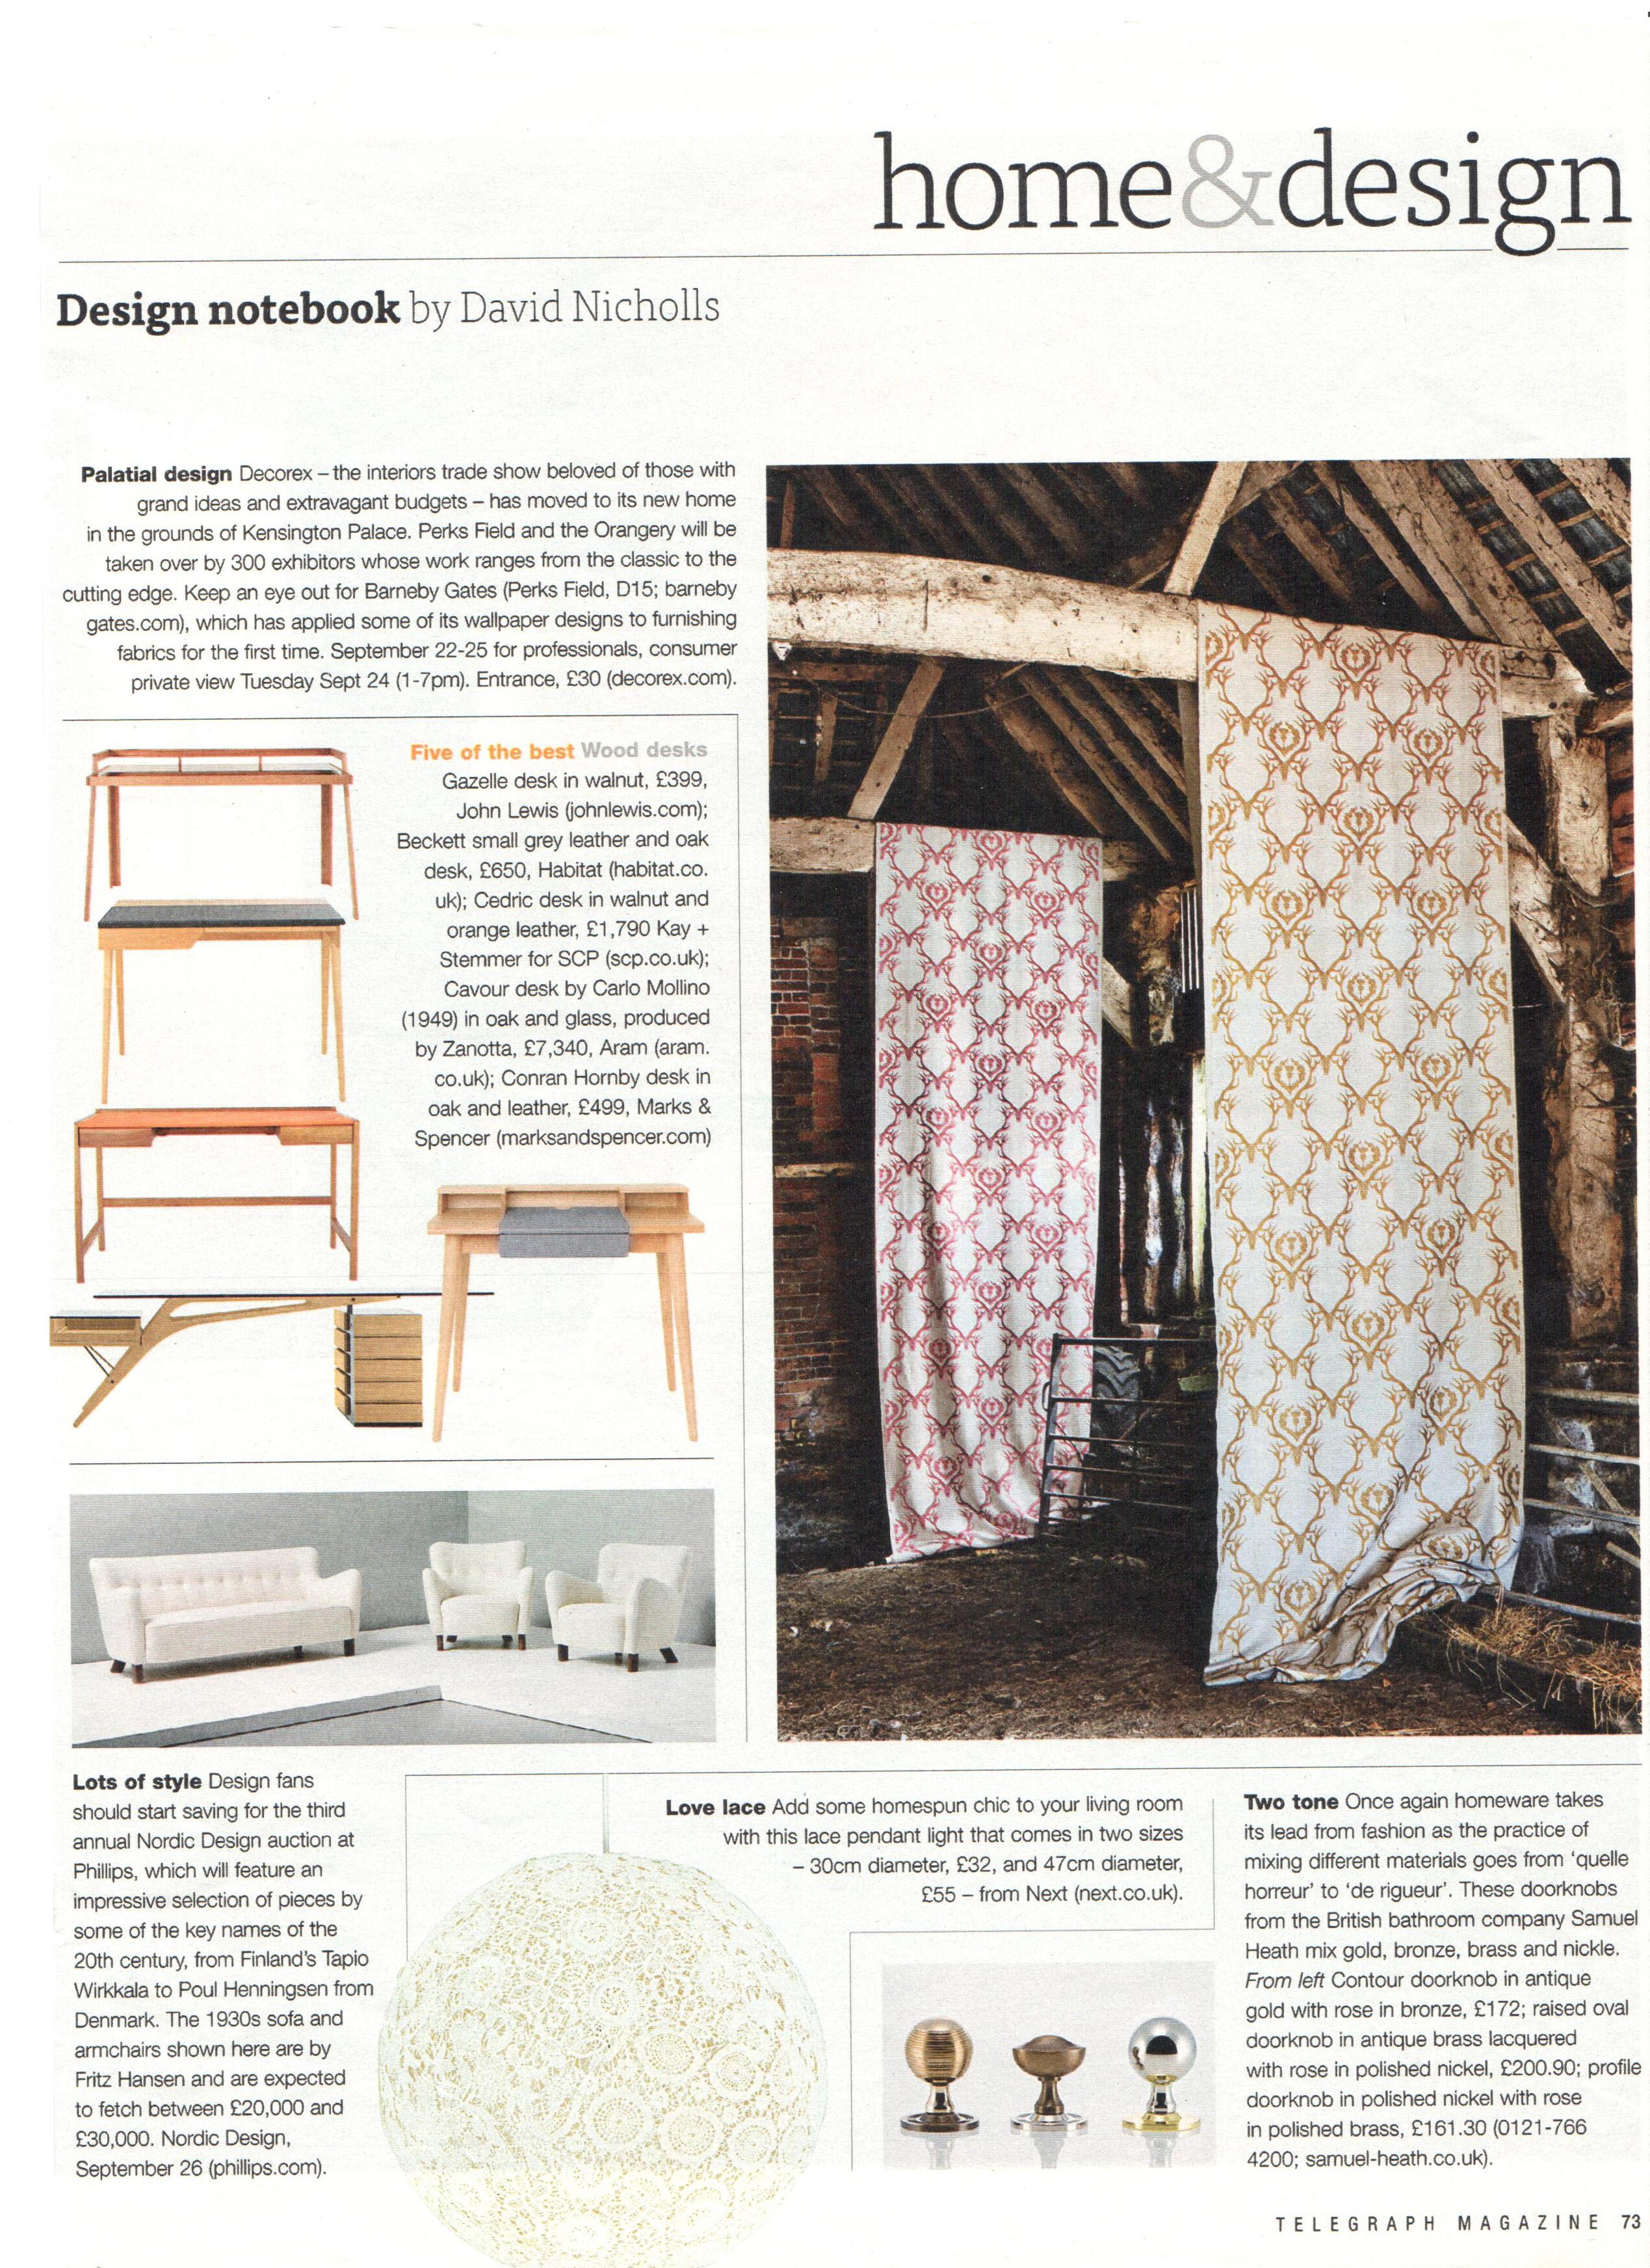 2013 Sept - Telegraph Magazine - Design Notebook - Article